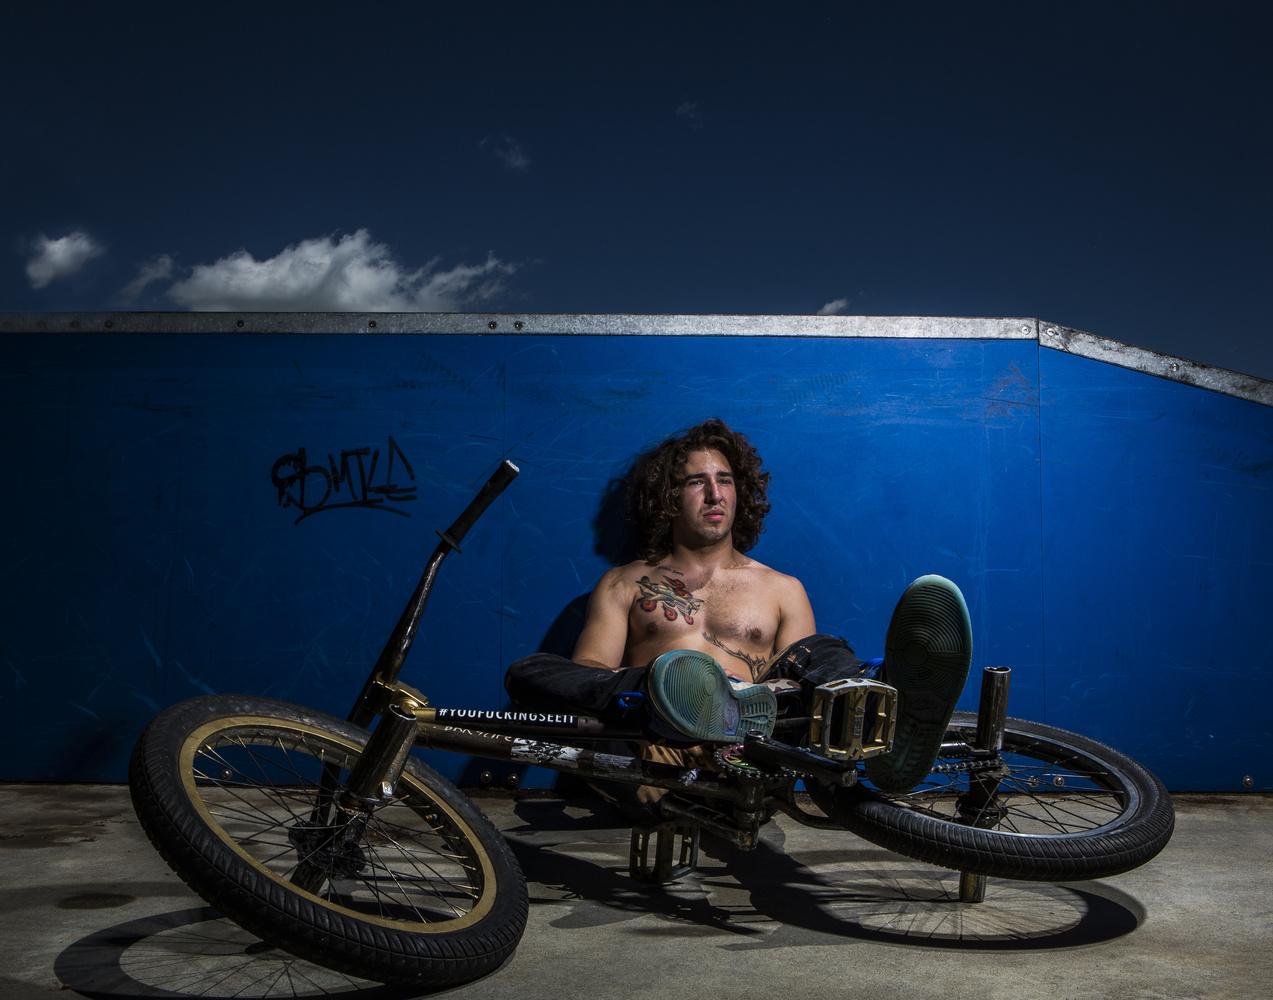 Bmx rider by Benjamin Henault